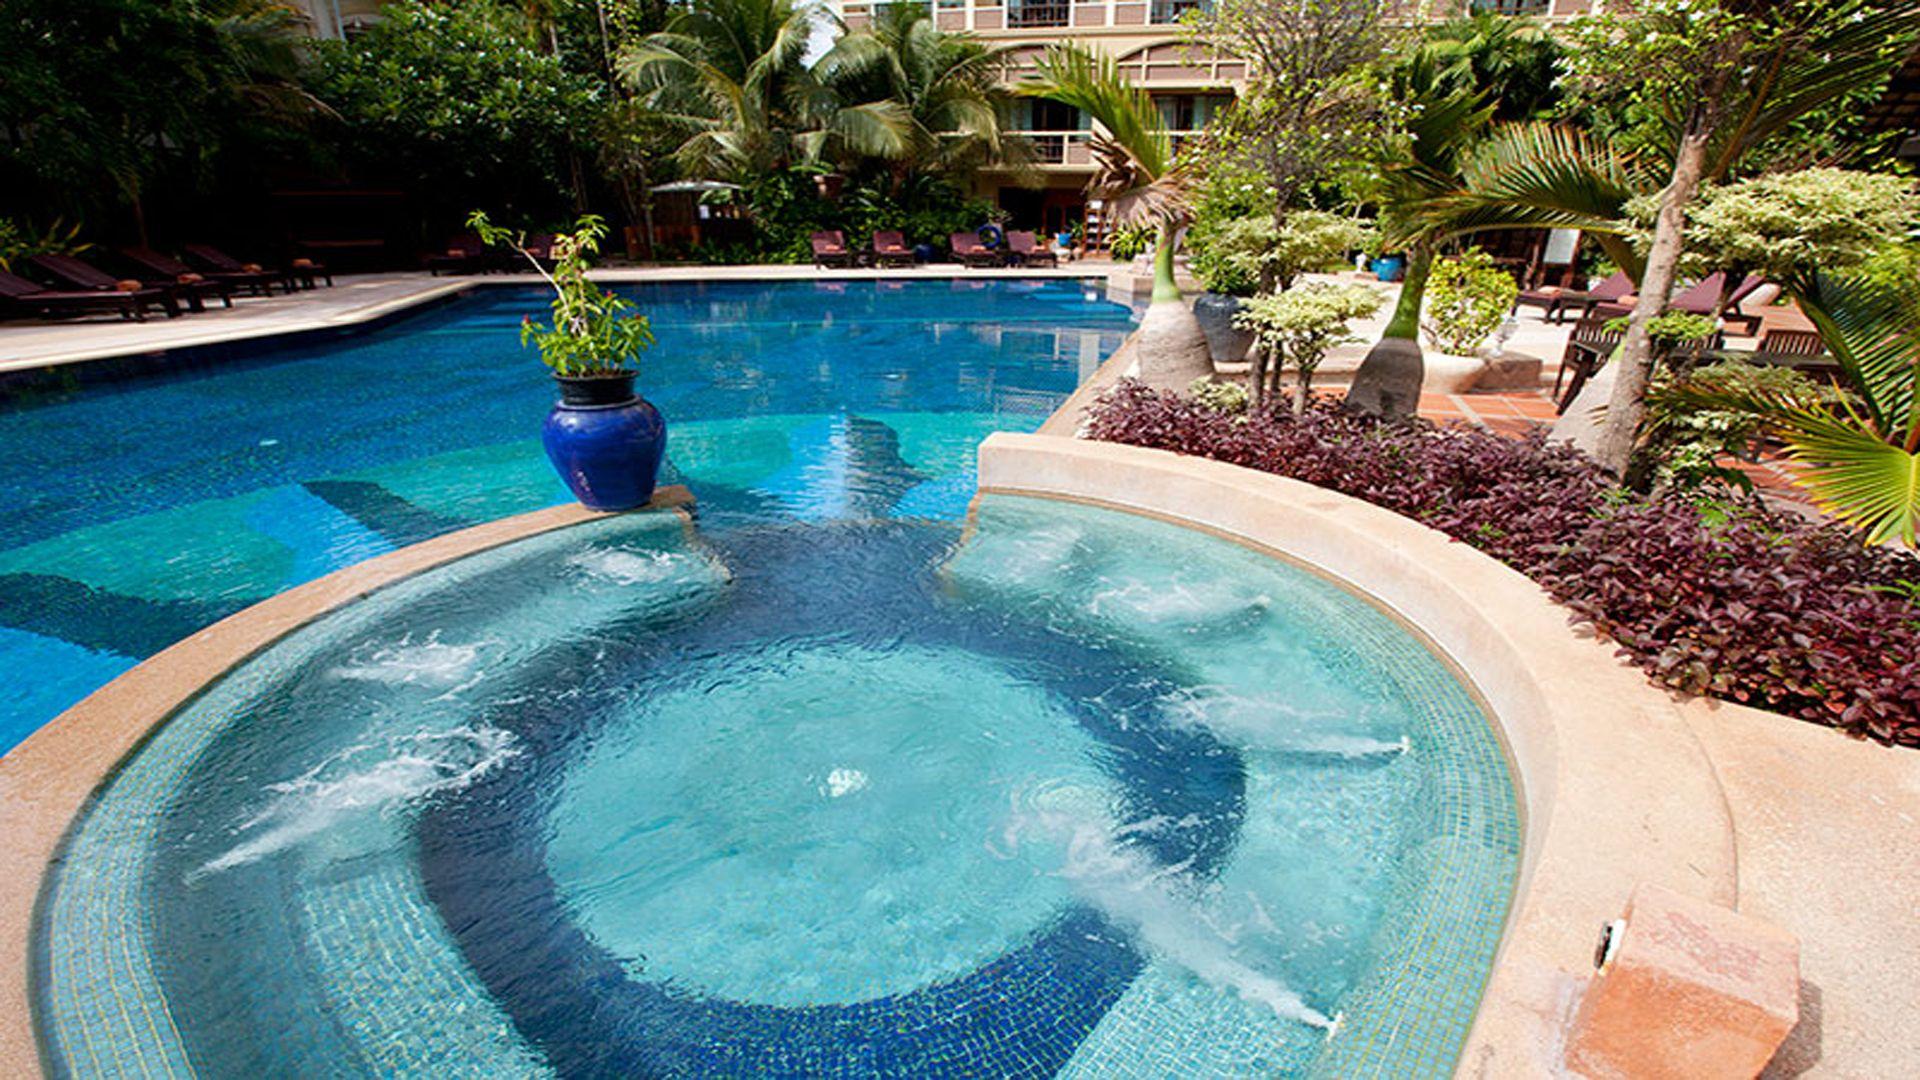 Prince d 39 angkor hotel spa saltwater swimming pool - Hotels with saltwater swimming pools ...